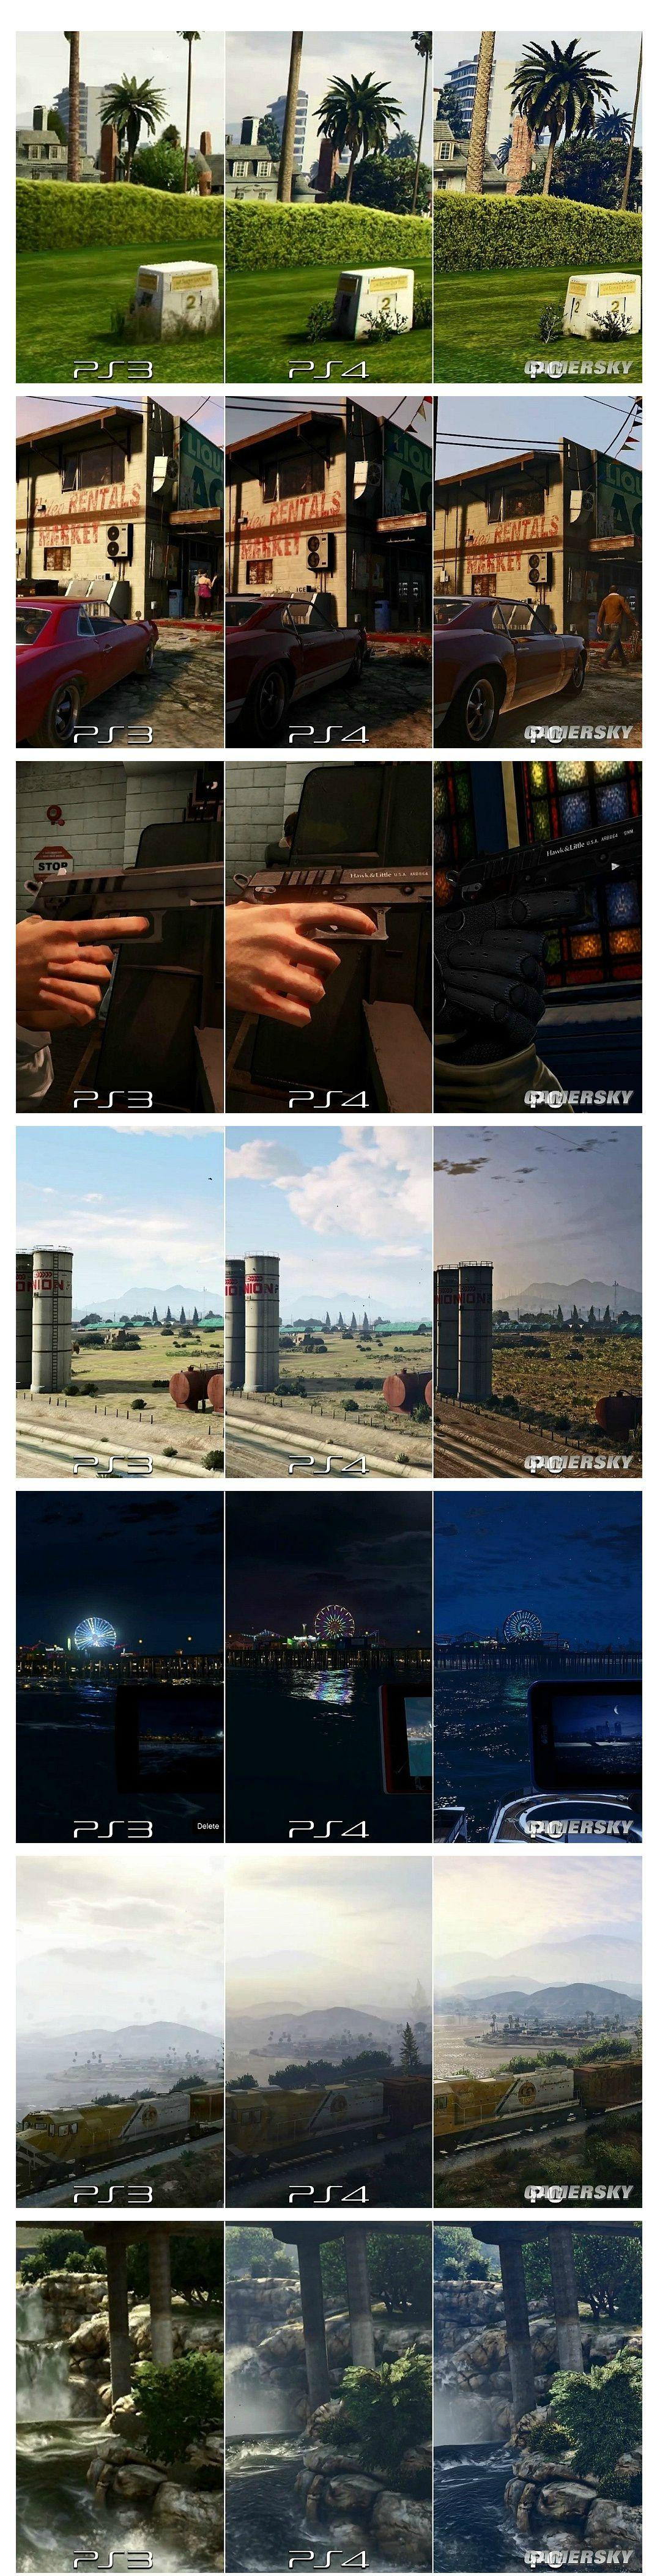 GTA5 콘솔판 vs PC판 그래픽 비교.jpg